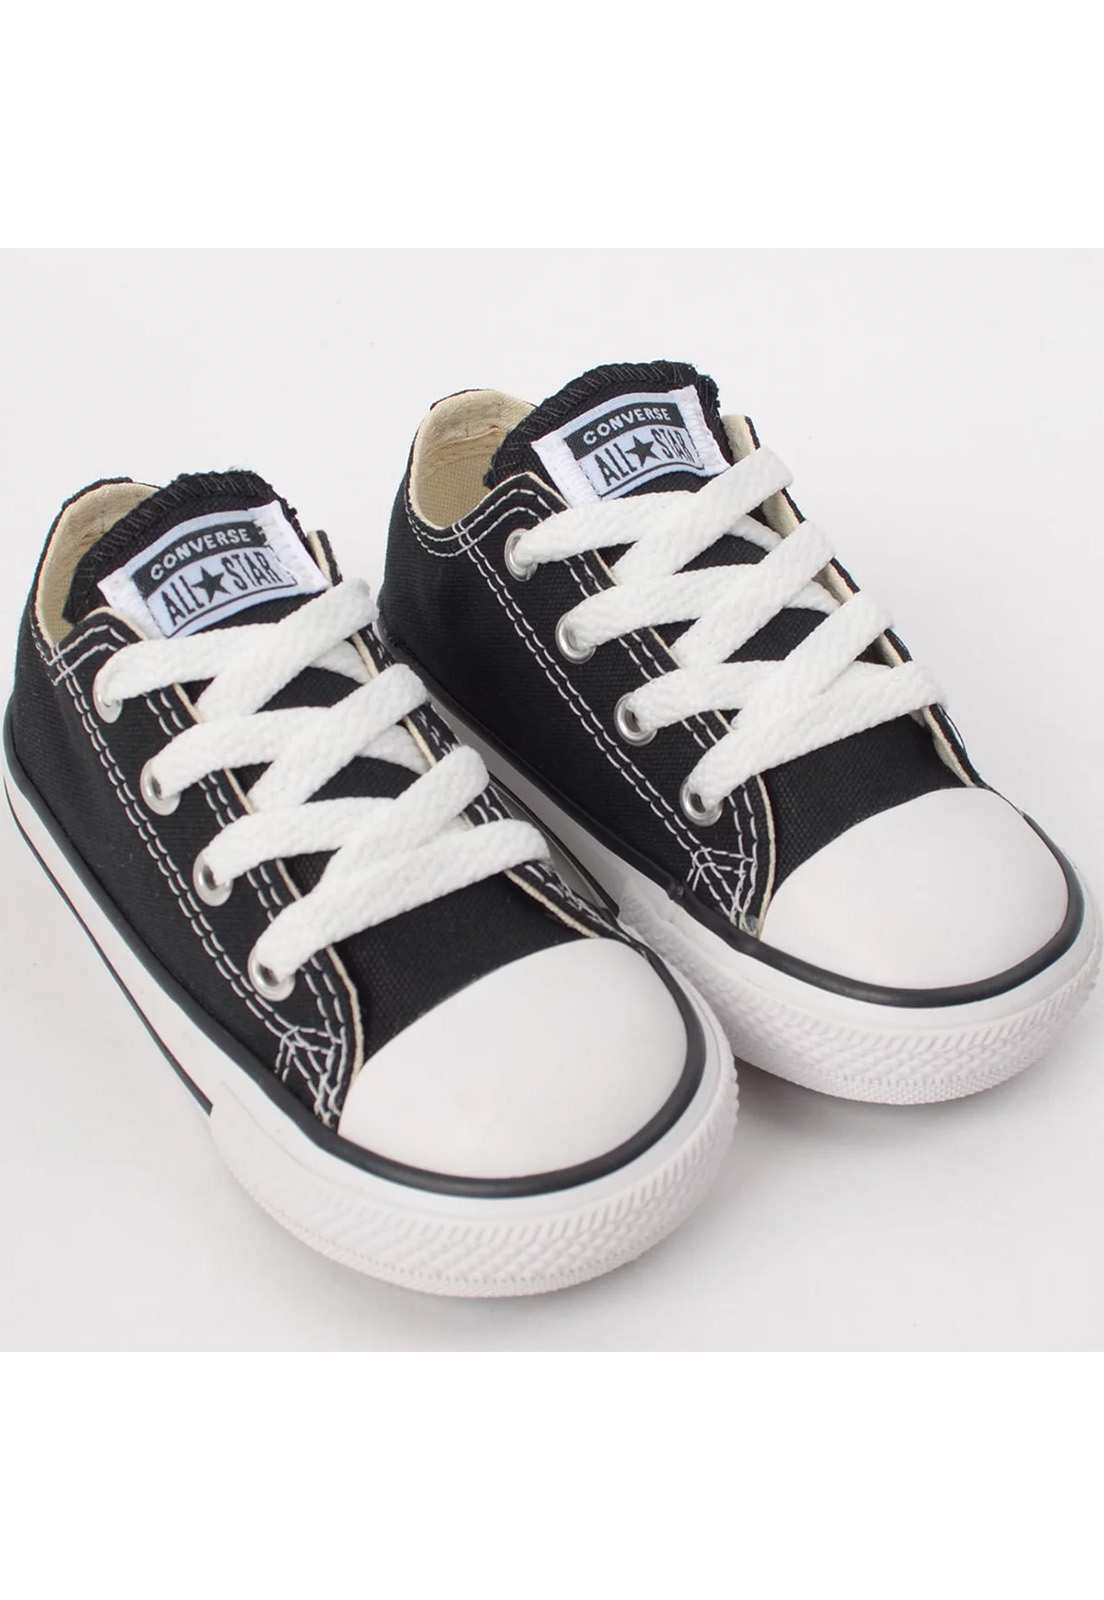 Tênis Converse Chuck Taylor All Star Kids Ox Preto CK00010002